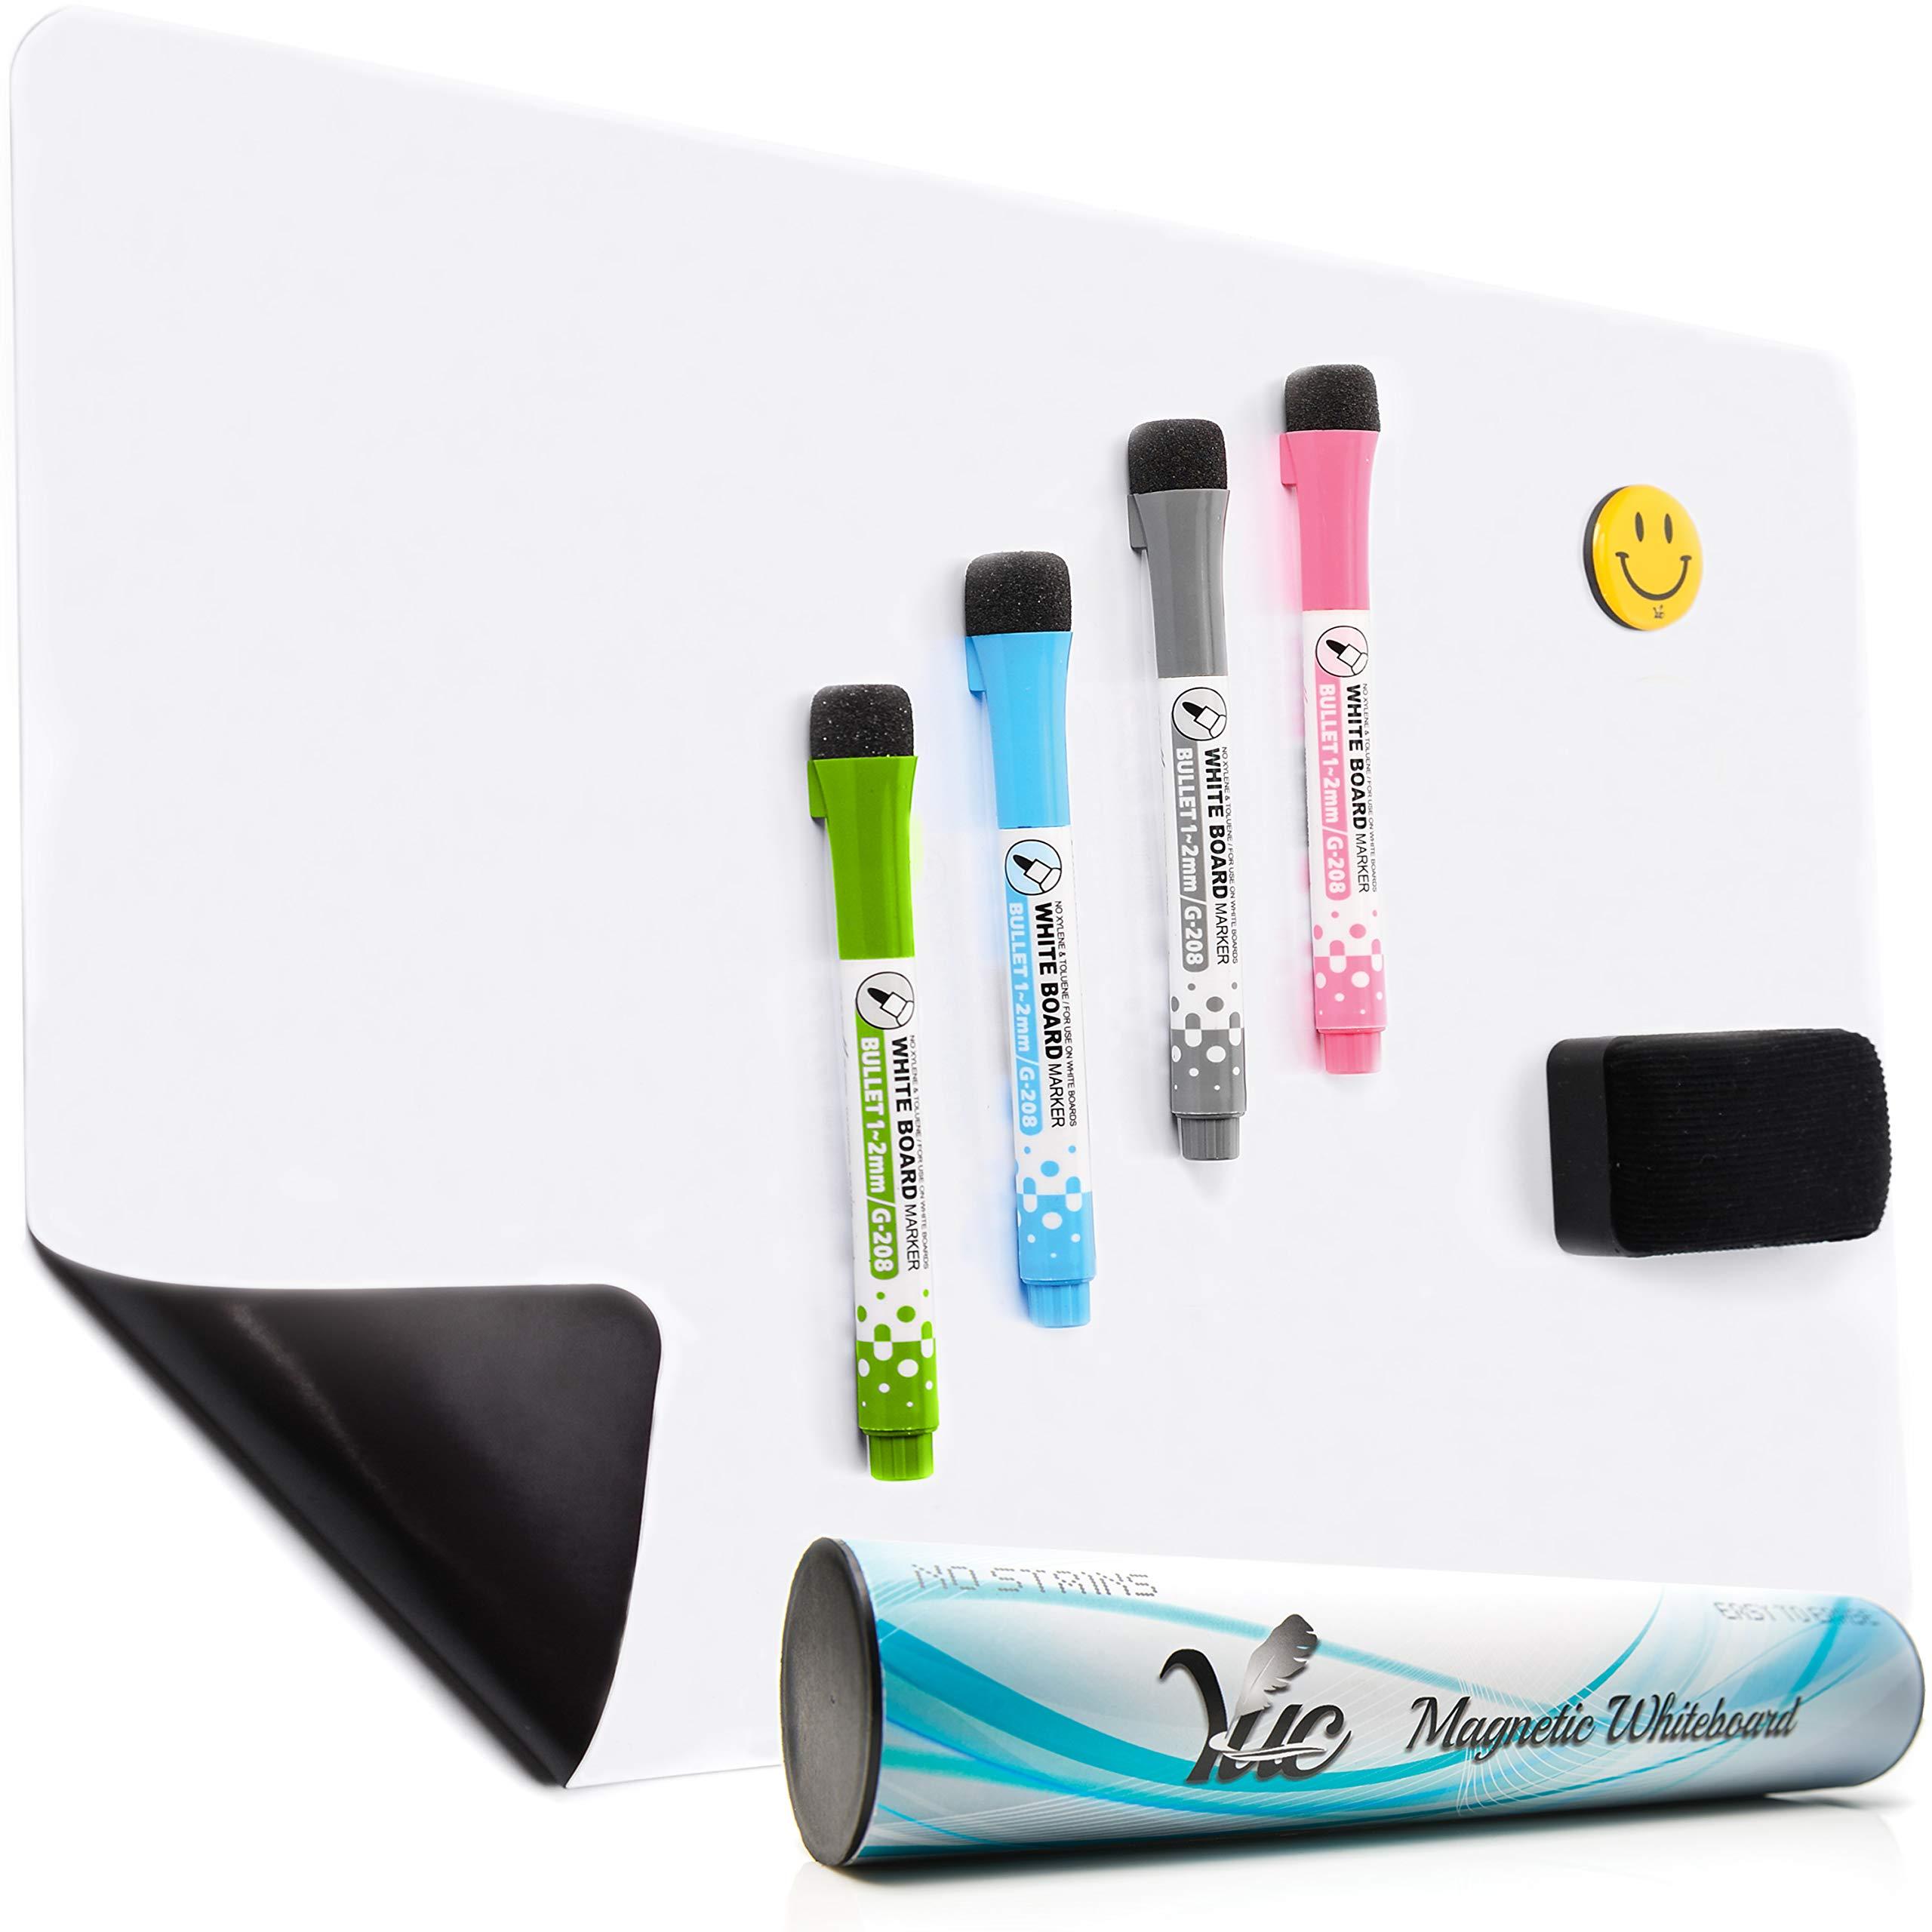 Magnetic Dry Erase White Board for Fridge, Magnetic Whiteboard for Refrigerator, Kitchen Whiteboard, Dry Erase Reminder Board (17x11) Three Sizes